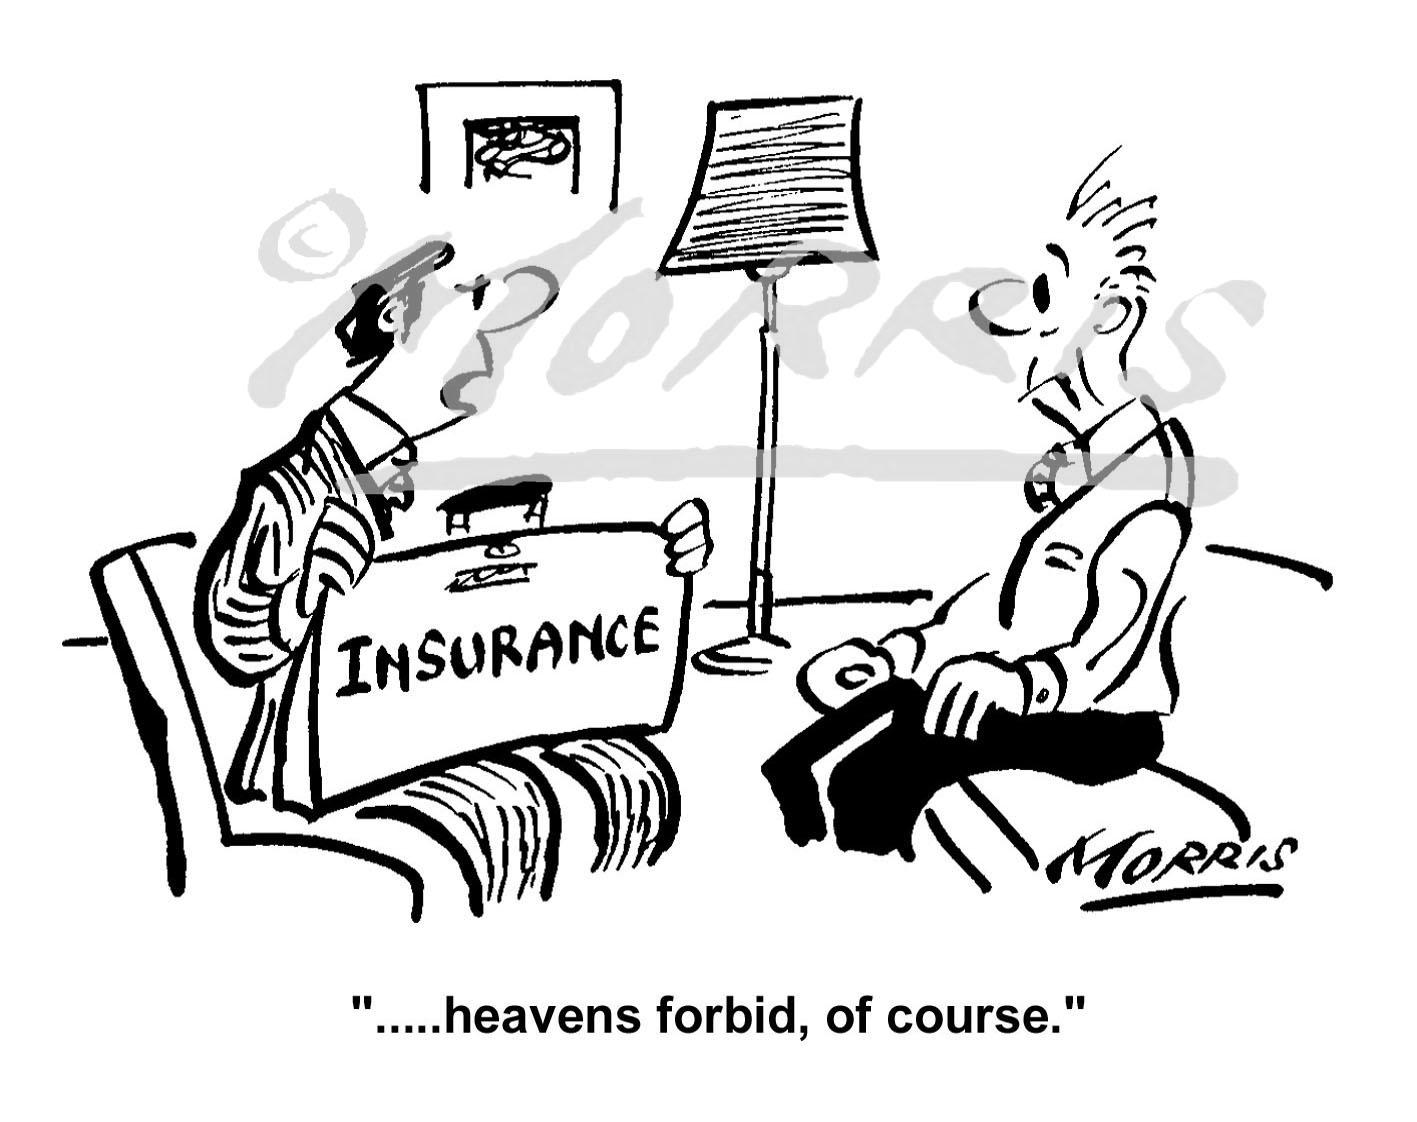 Insurance policy business cartoon Ref: 1430bw